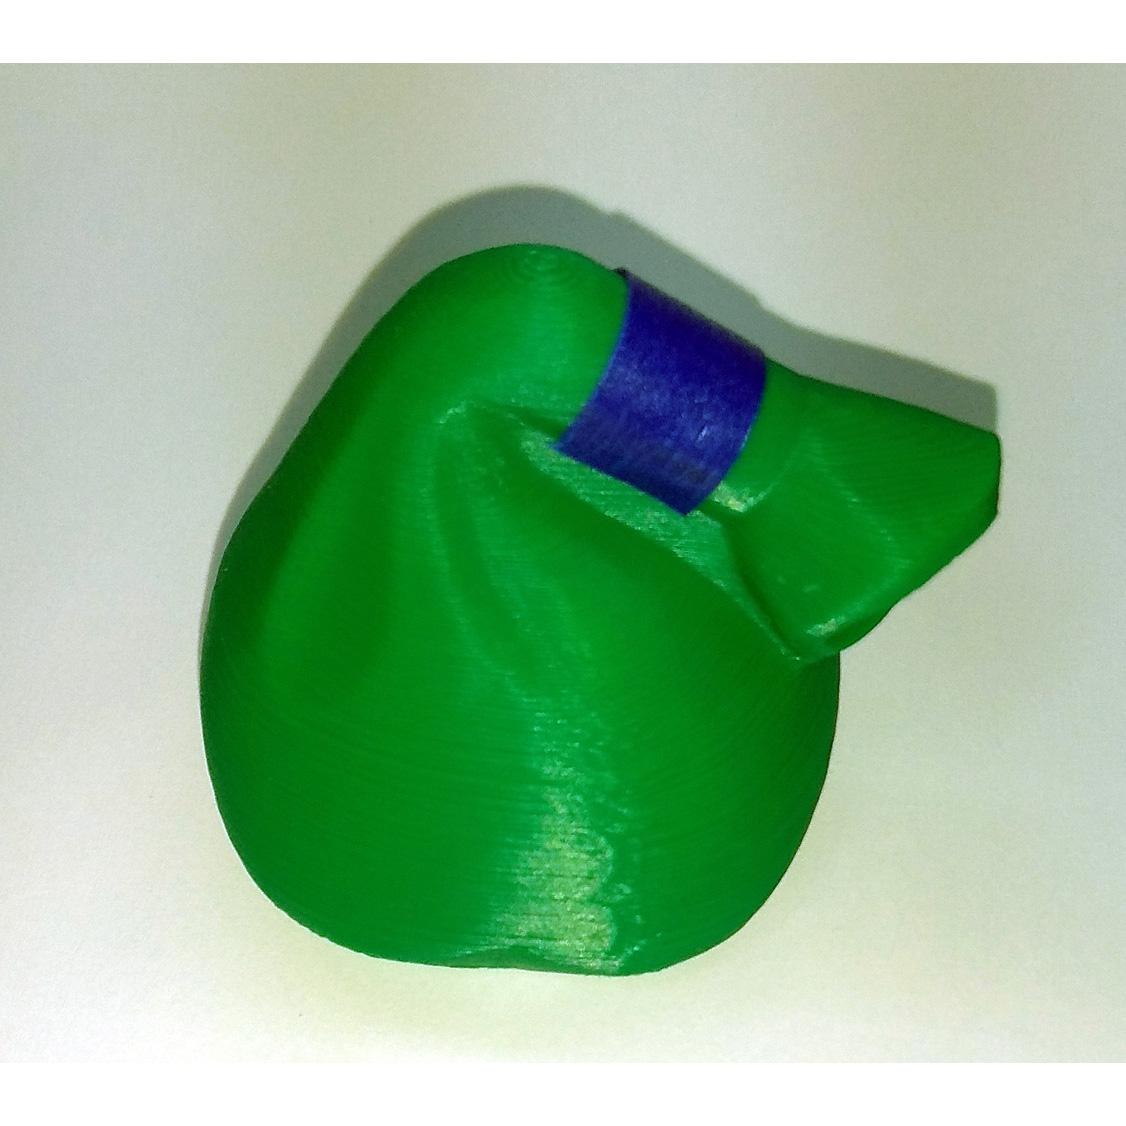 Lego_Minifig_-_Santa_Clause_13.jpg Download free STL file Jumbo Christmas - Santa Claus • 3D printer template, HowardB